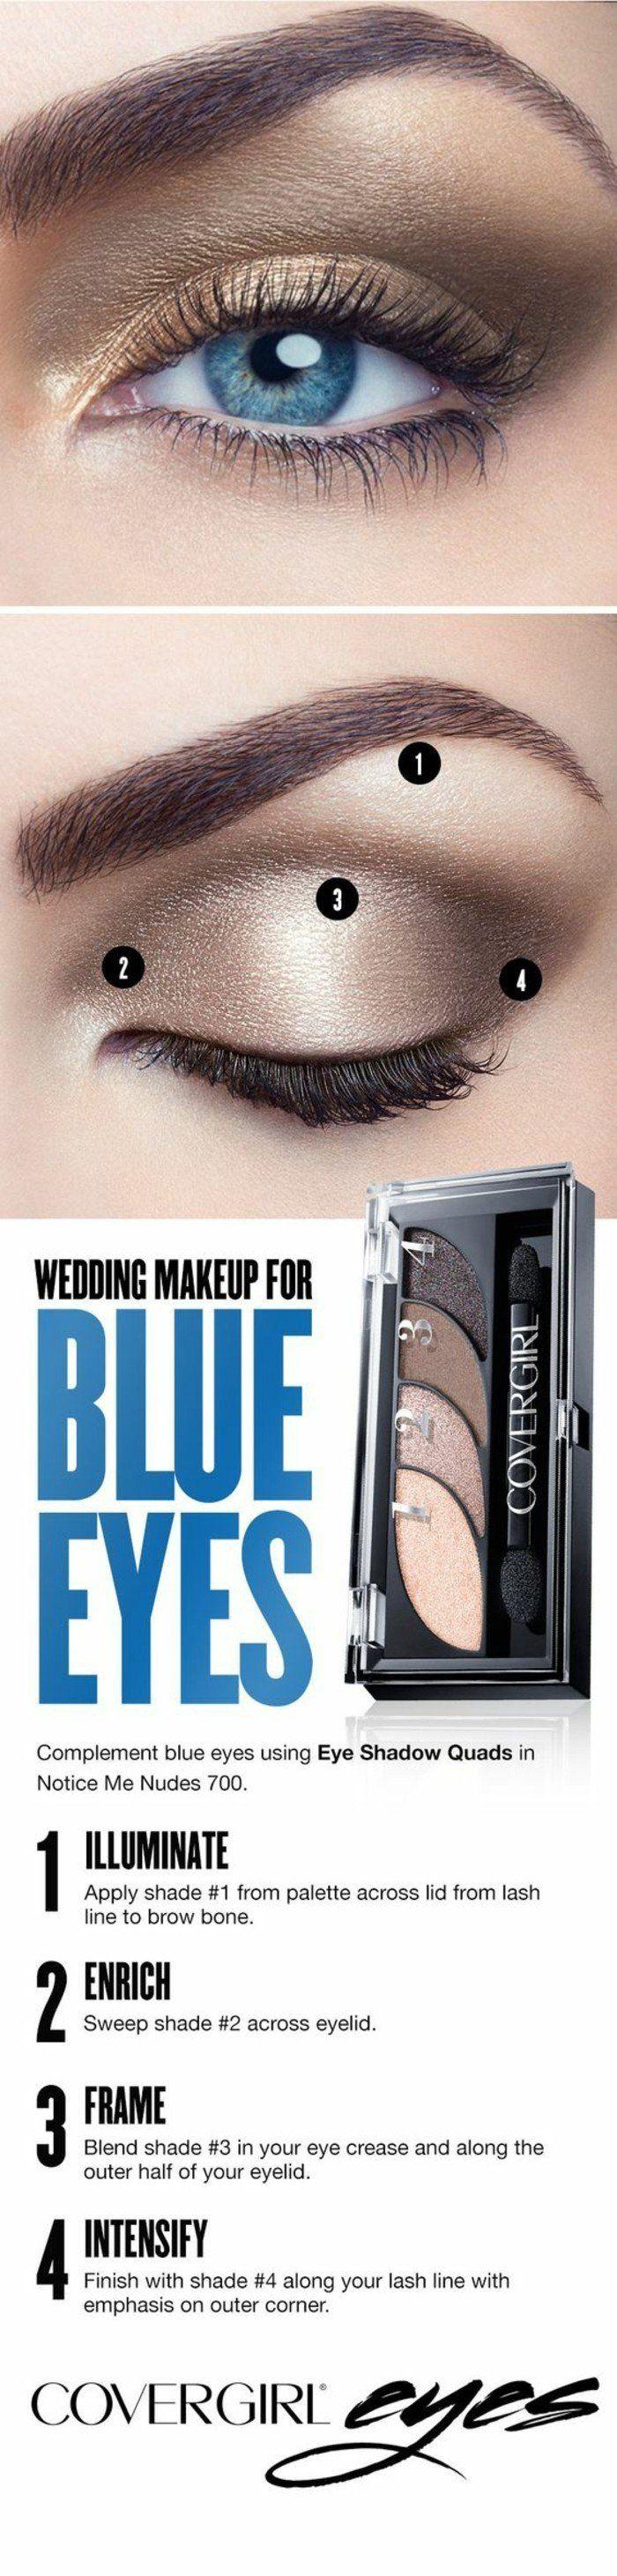 17 meilleures id es propos de maquillage yeux bleus sur pinterest maquillage yeux bleus. Black Bedroom Furniture Sets. Home Design Ideas